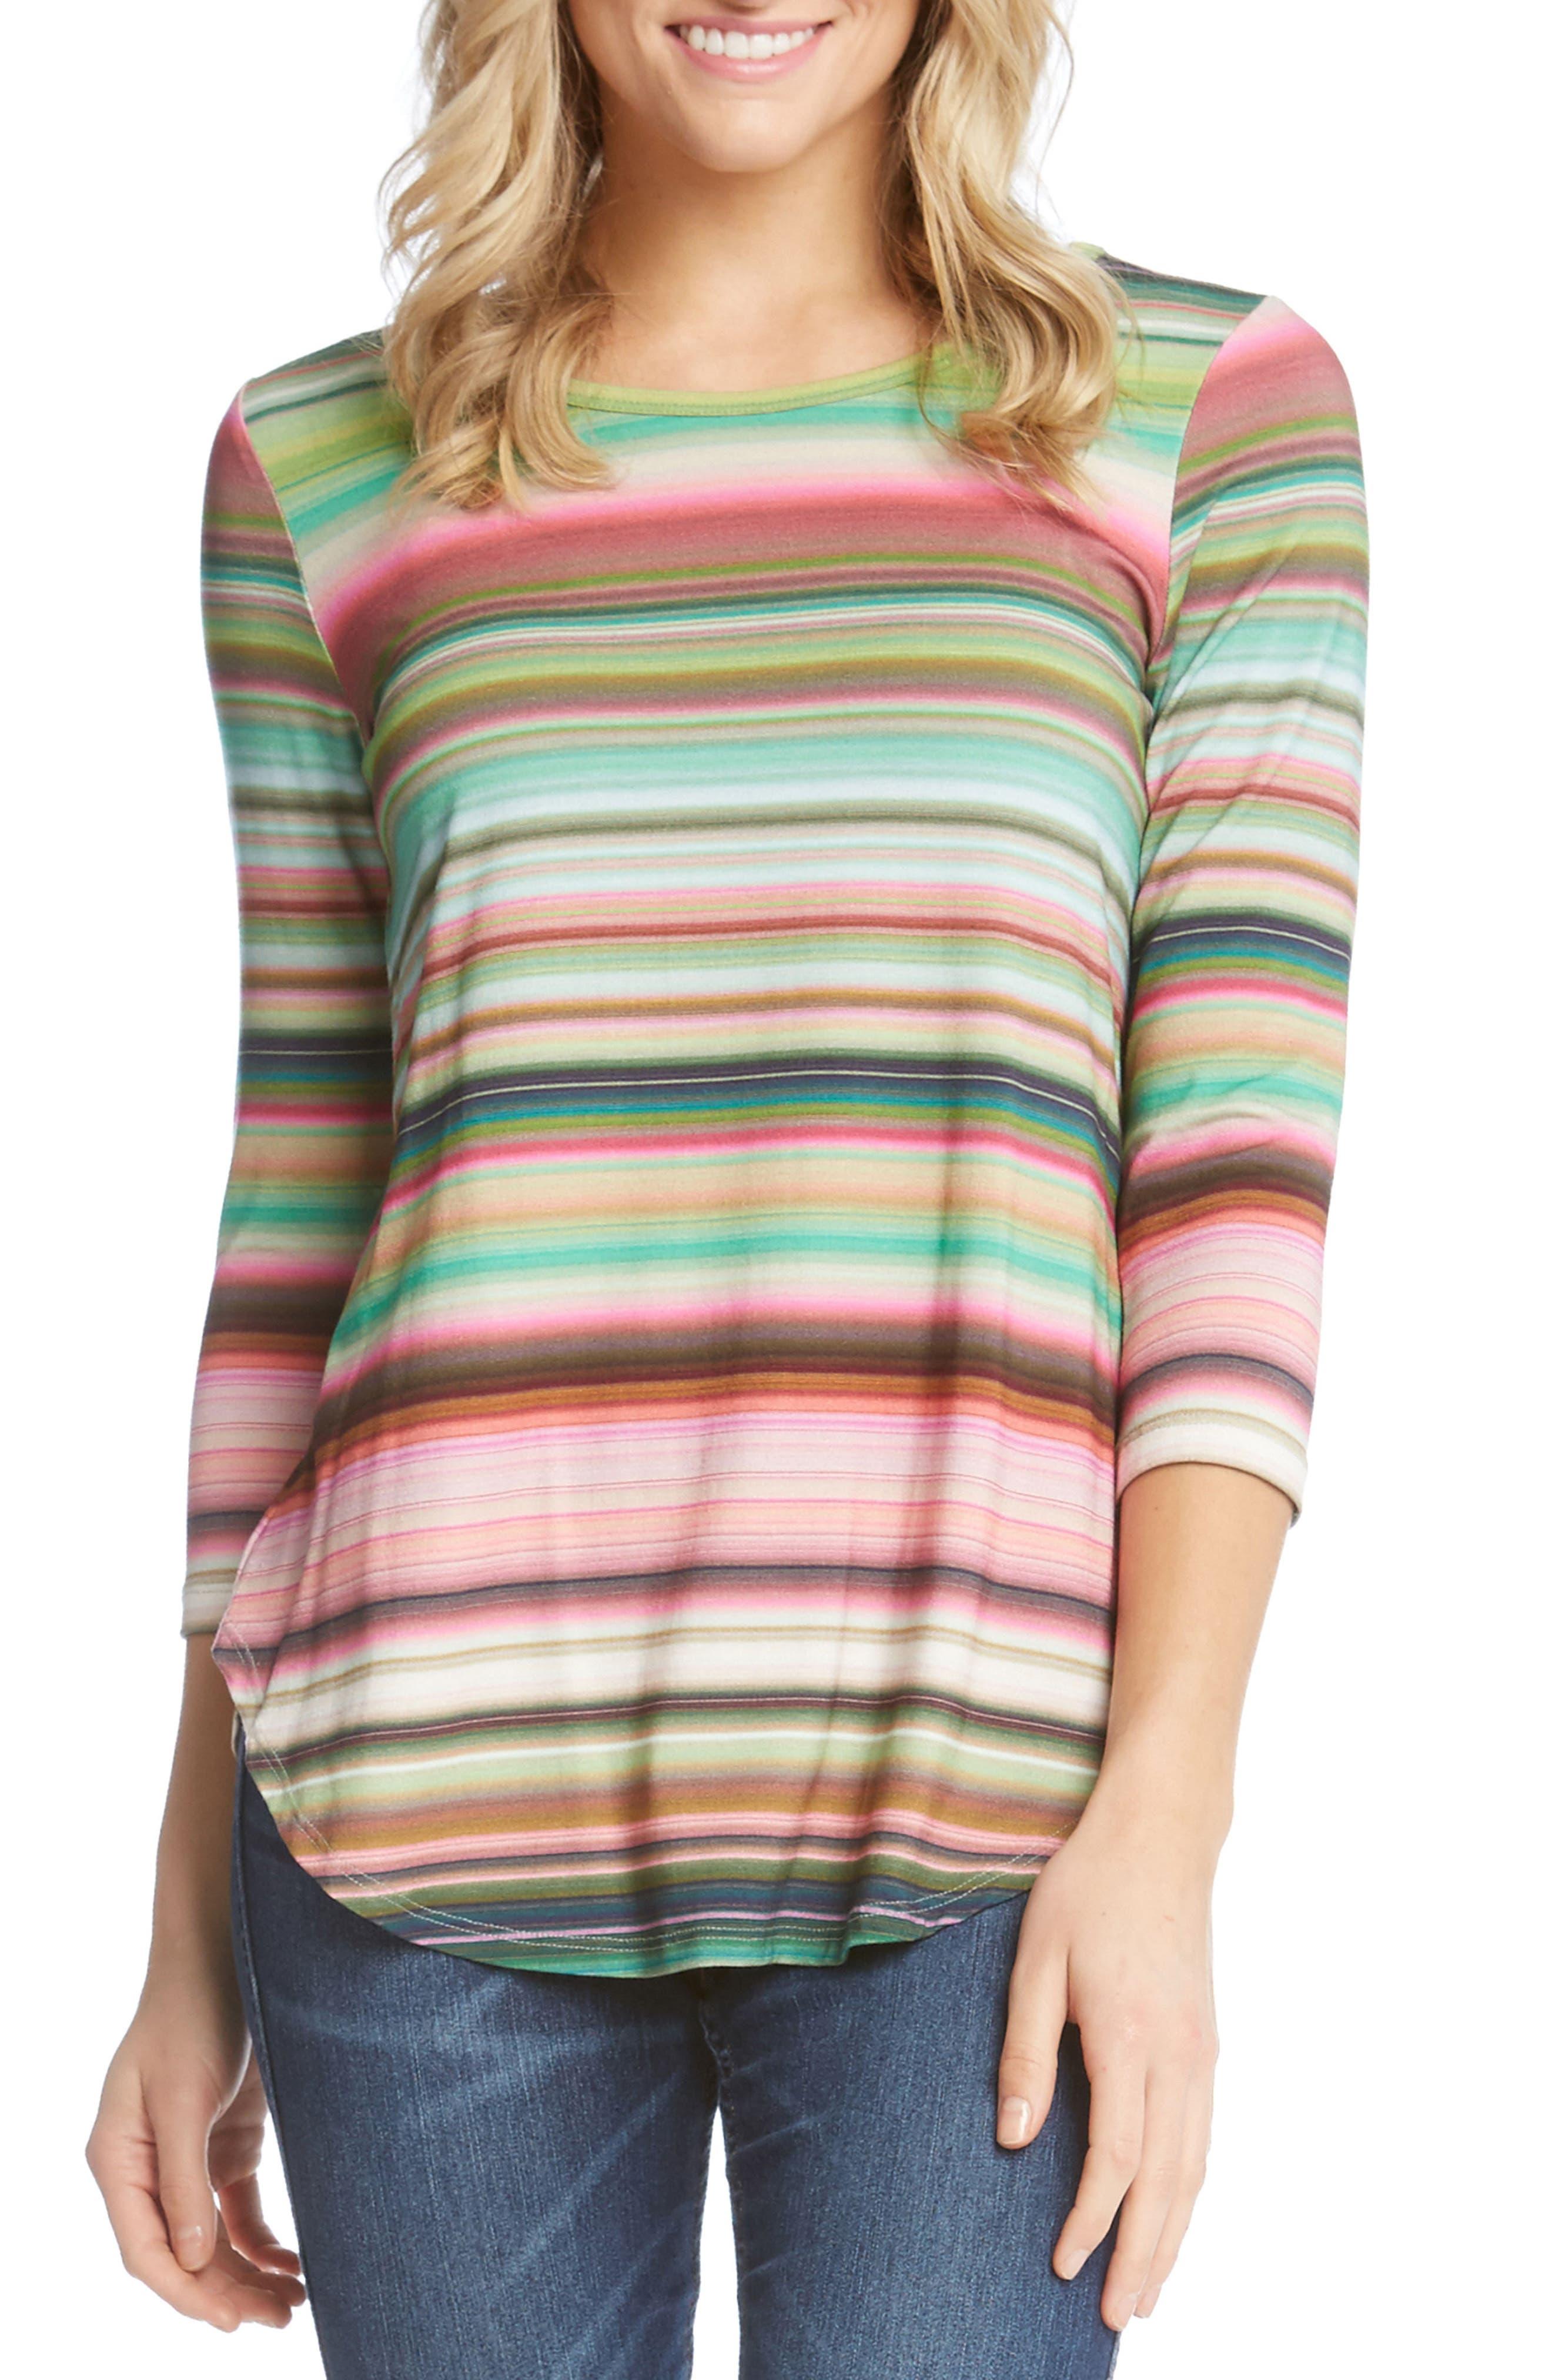 KAREN KANE Mixed Stripe Top, Main, color, 689